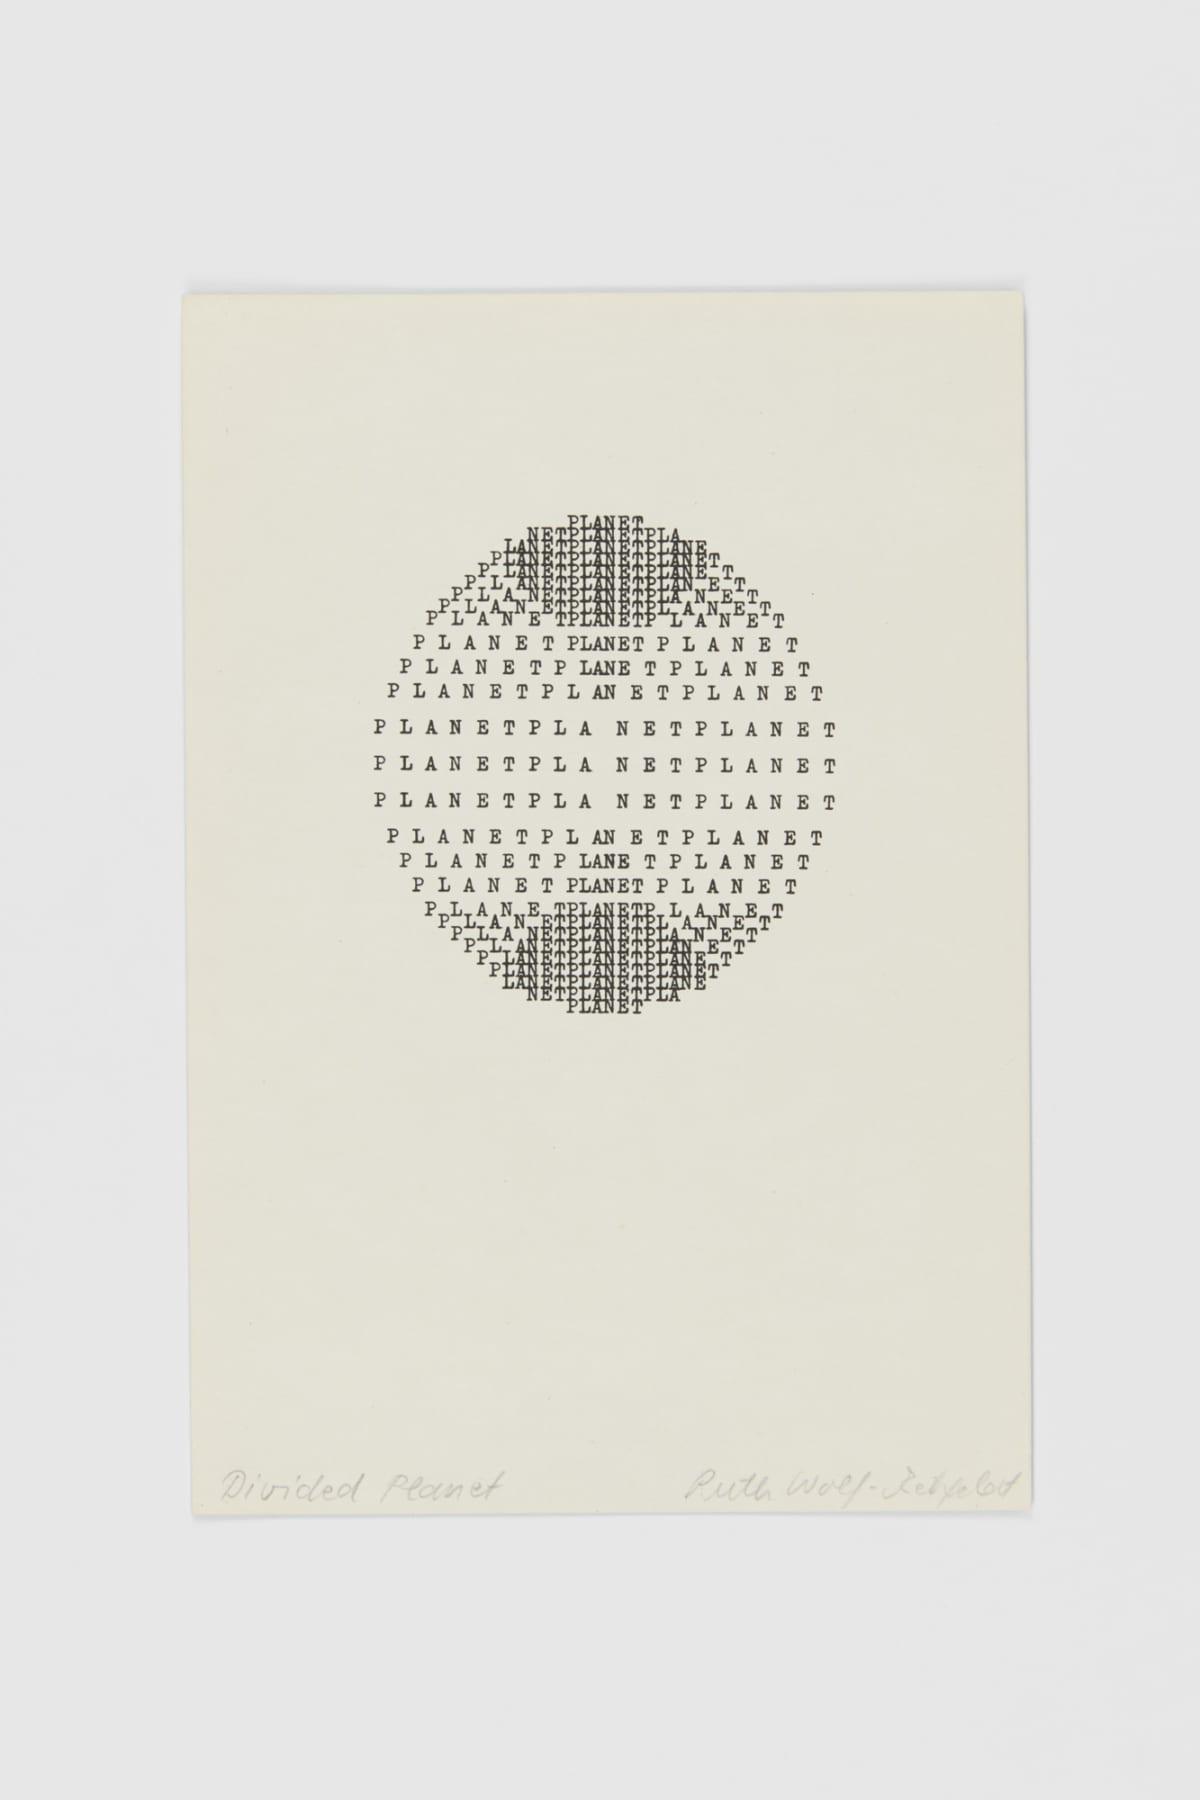 Ruth WOLF-REHFELDT Divided Planet., 1980 print (zinc lithograph) 21.6 x 14.9 cm